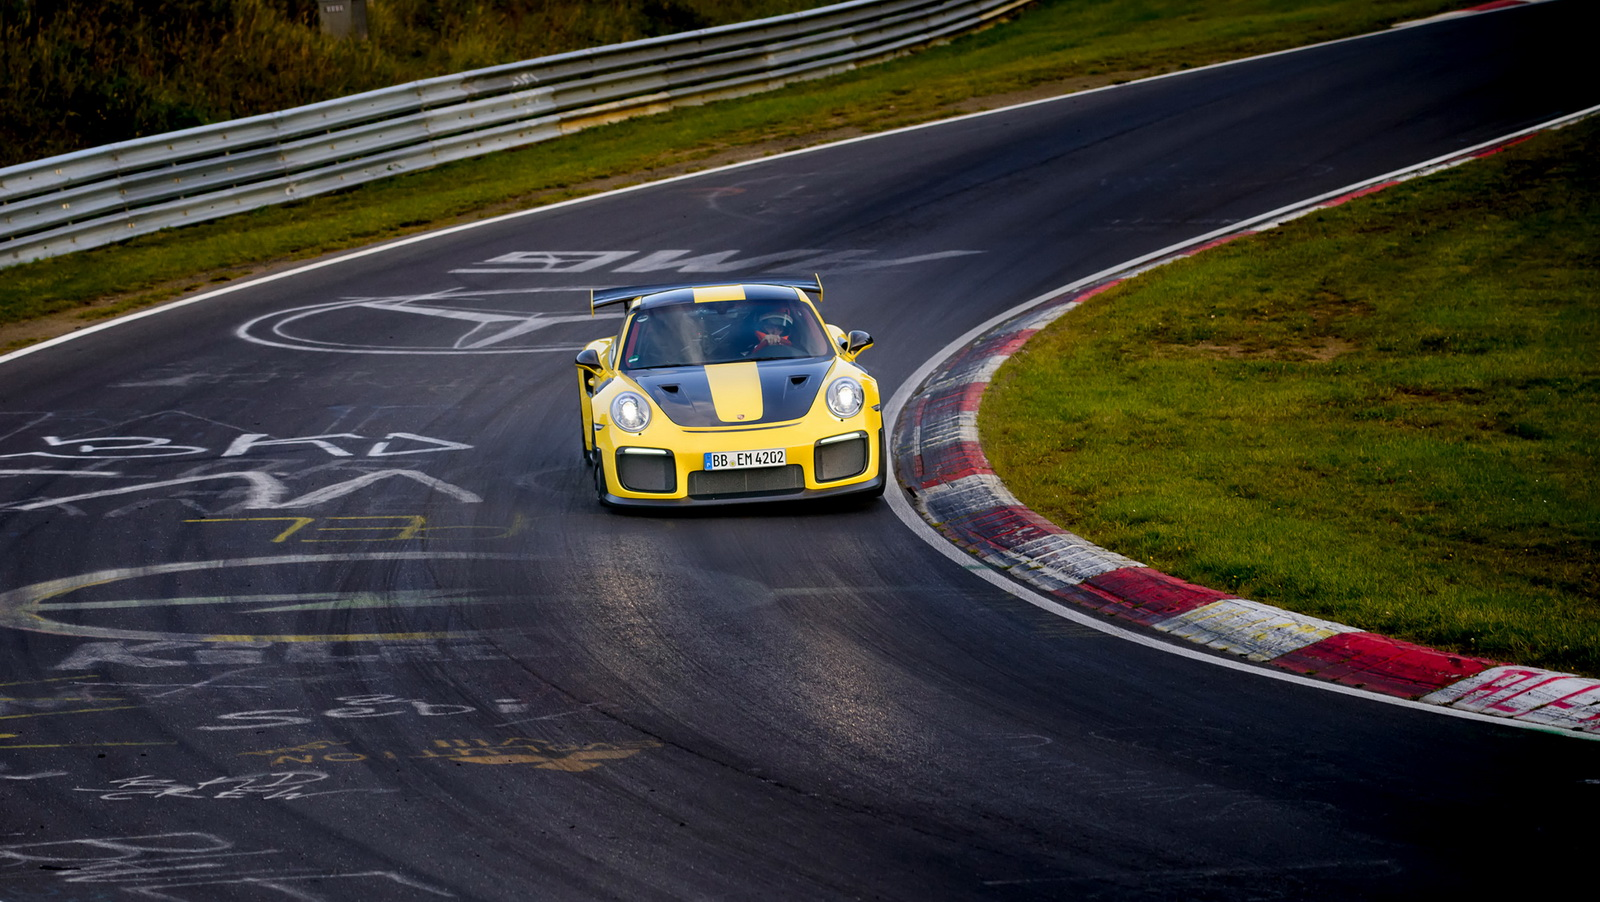 2018 porsche 911 gt2 rs nurburgring record